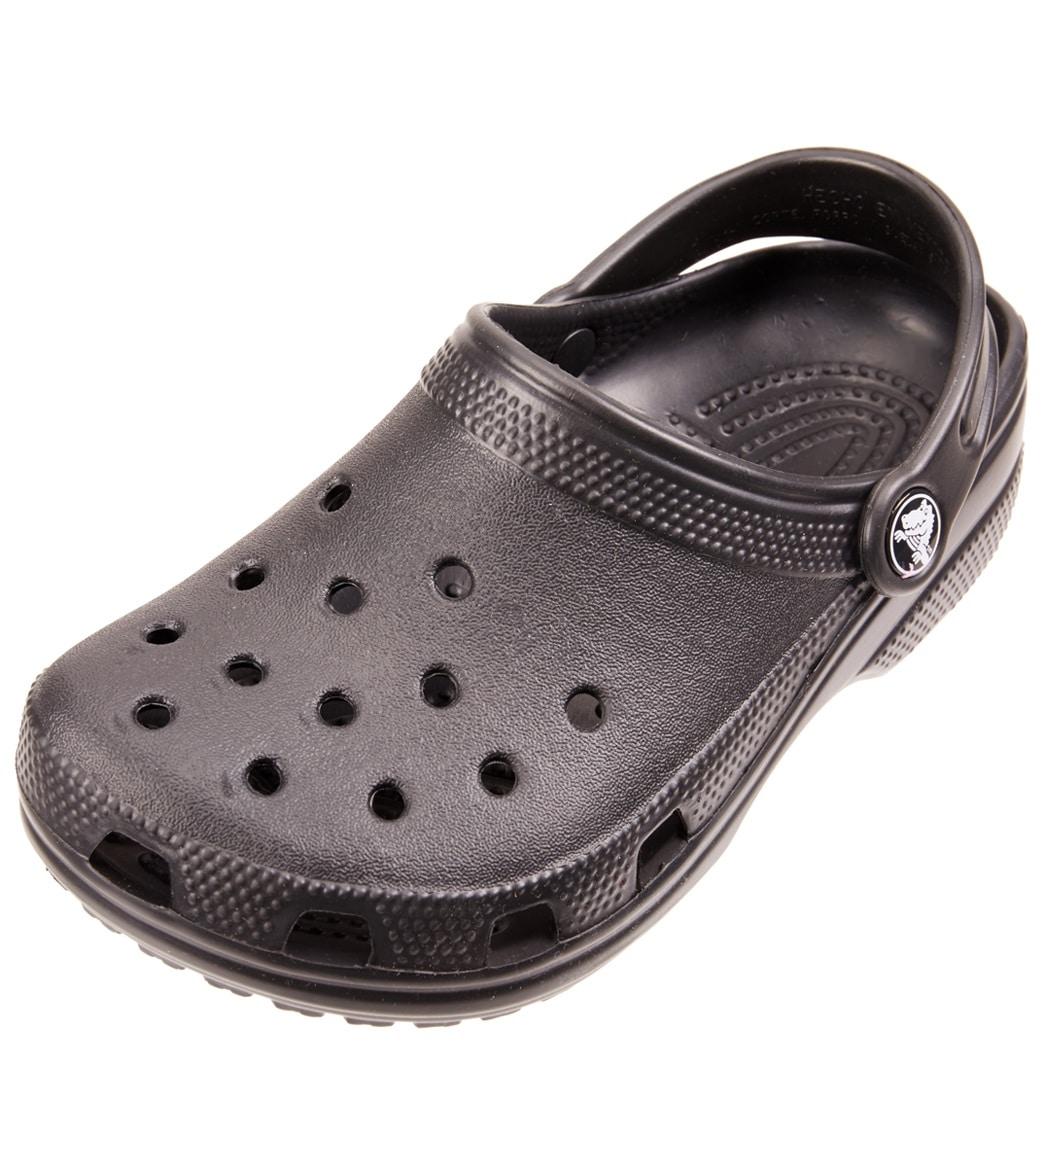 e42e1cc9b139e Crocs Kid s Classic Clog (Toddler  Little Kid  Big Kid) at ...